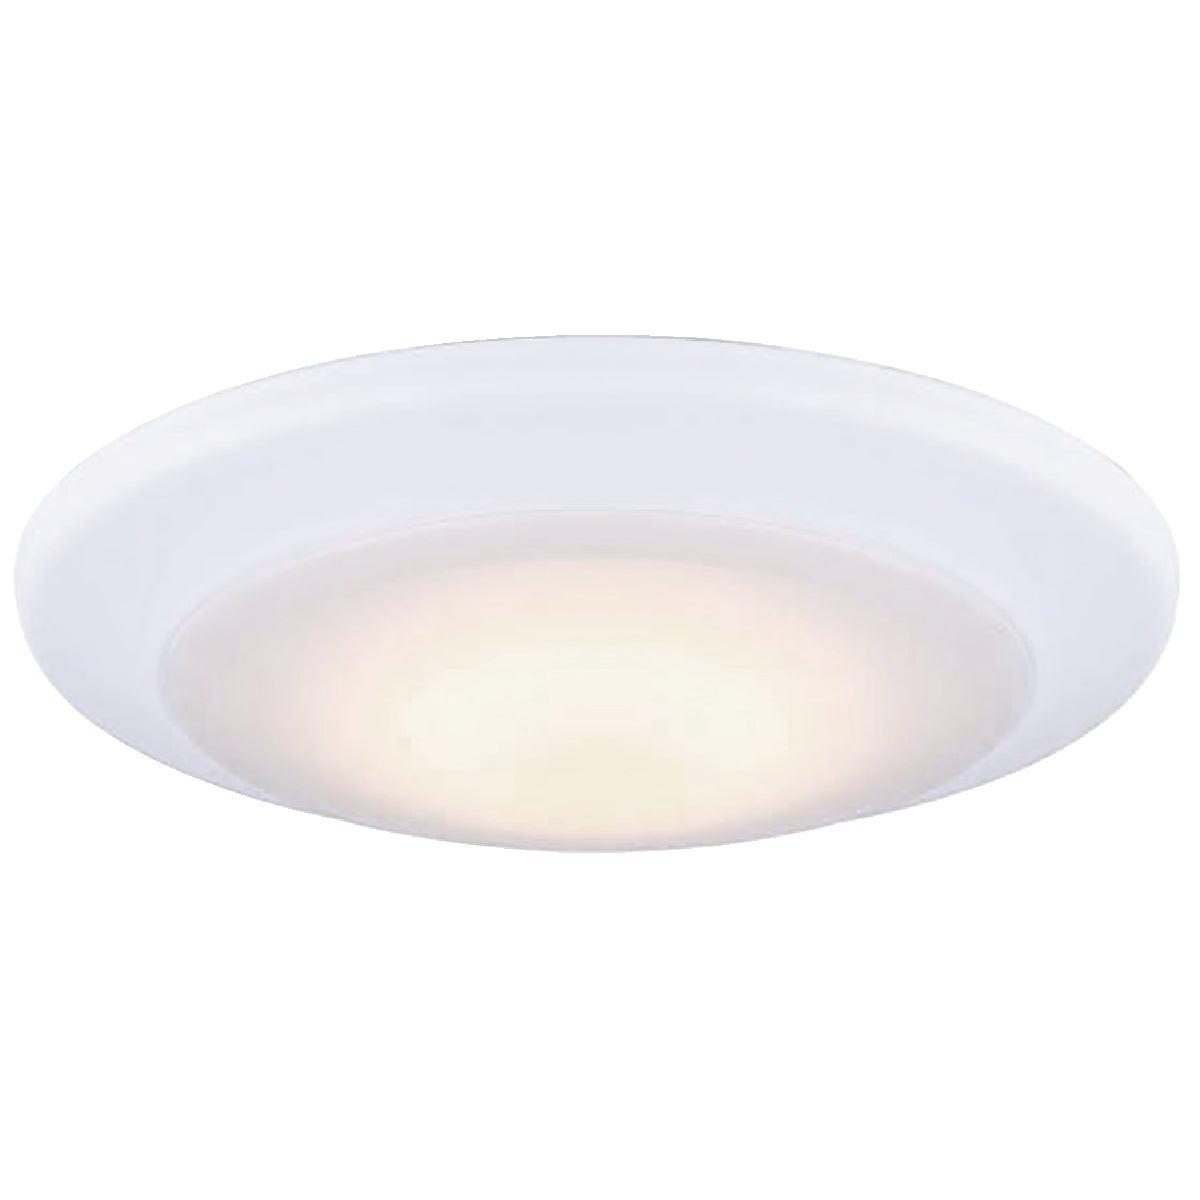 Canarm 6 In. White LED Disc Flush Mount Light Fixture